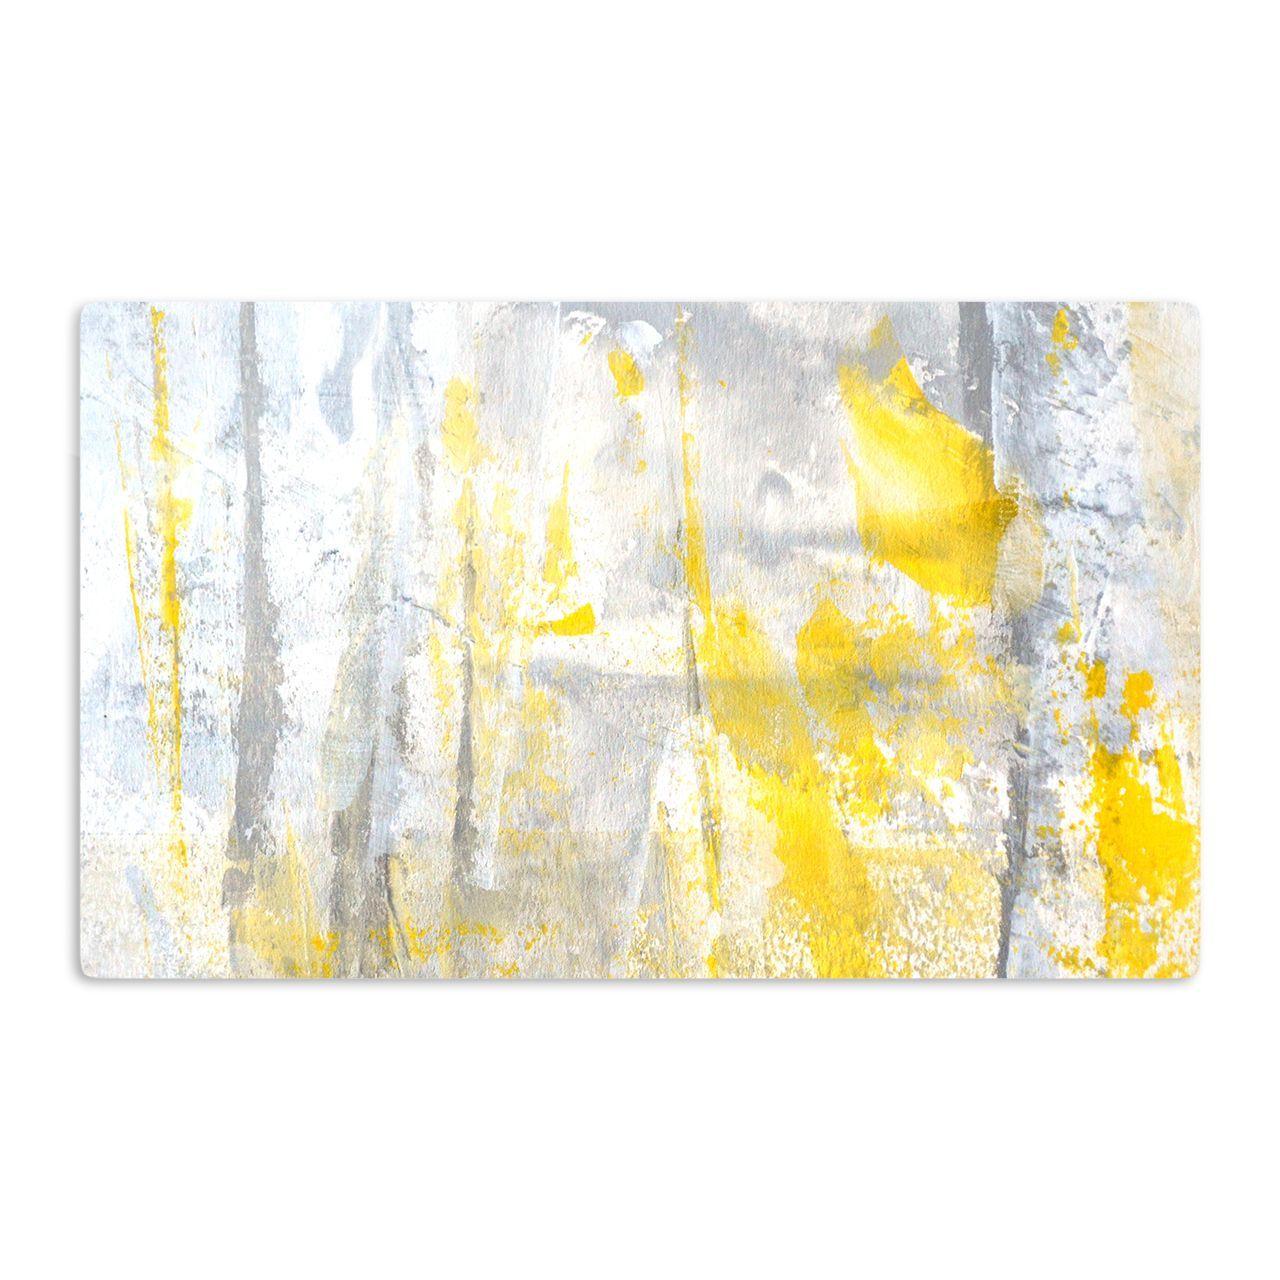 Kess inhouse carollynn tice uabstractionu yellow artistic magnet